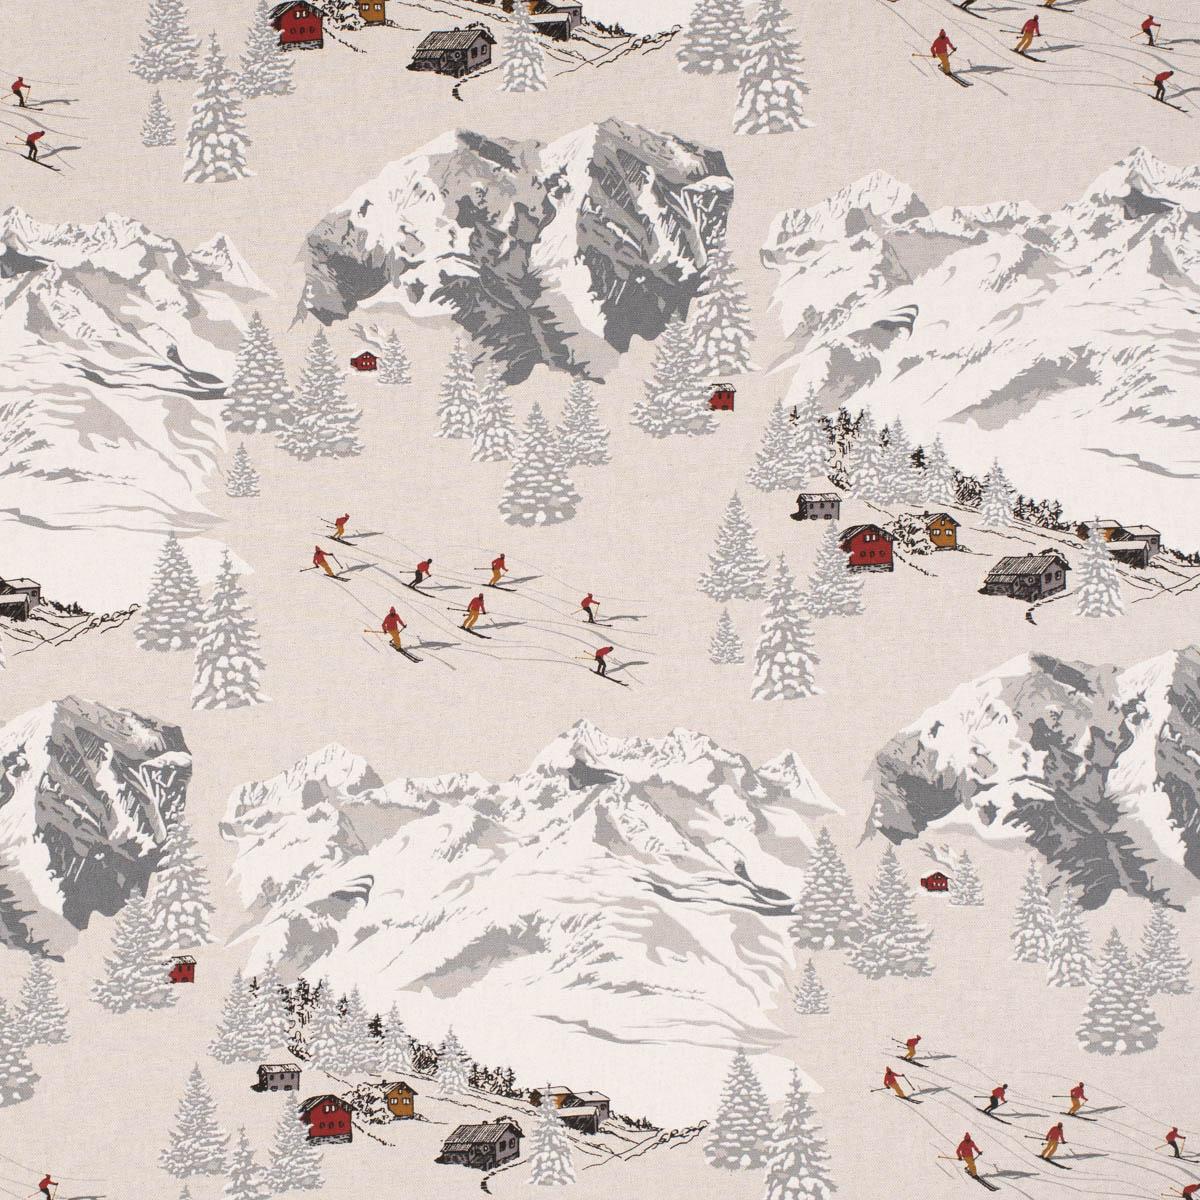 Dekostoff Halb-Panama Skifahrer Winterlandschaft natur grau 155cm Breite